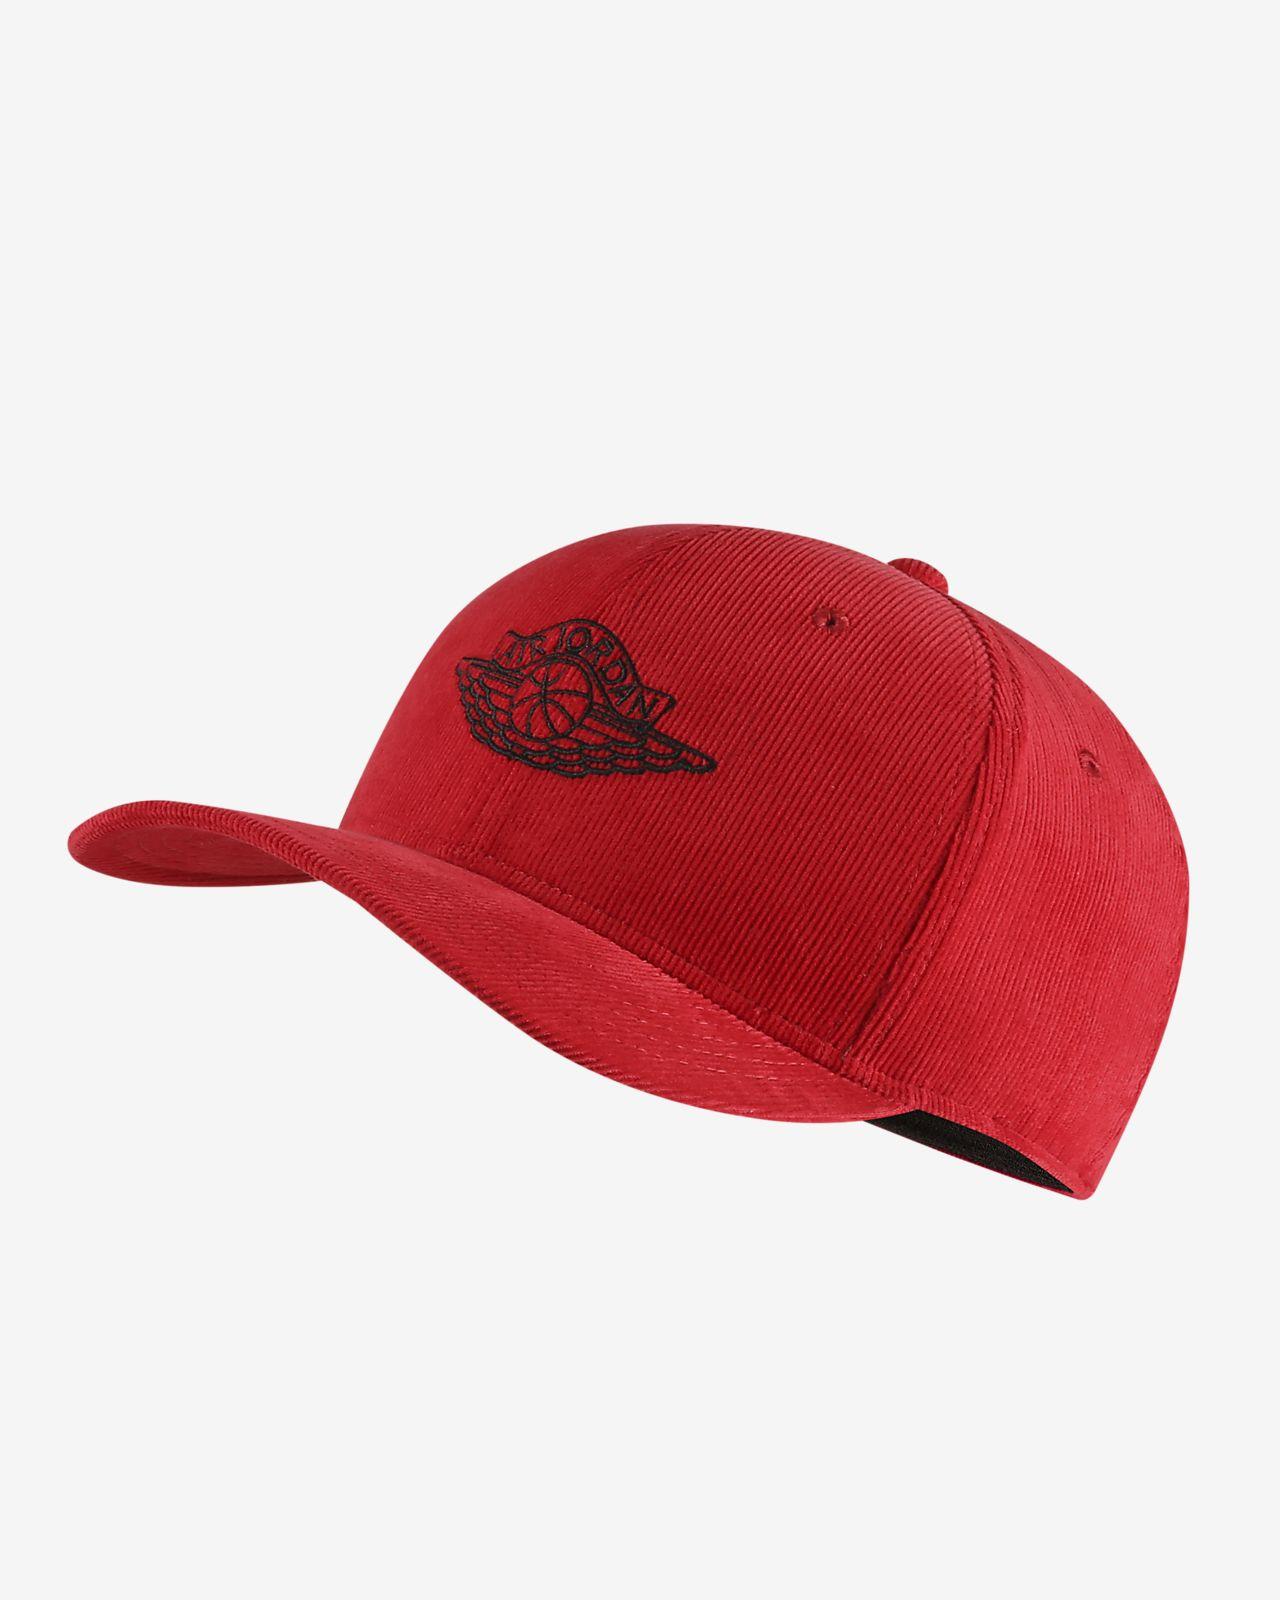 233a2358f1d Jordan Classic99 Wings Hat. Nike.com